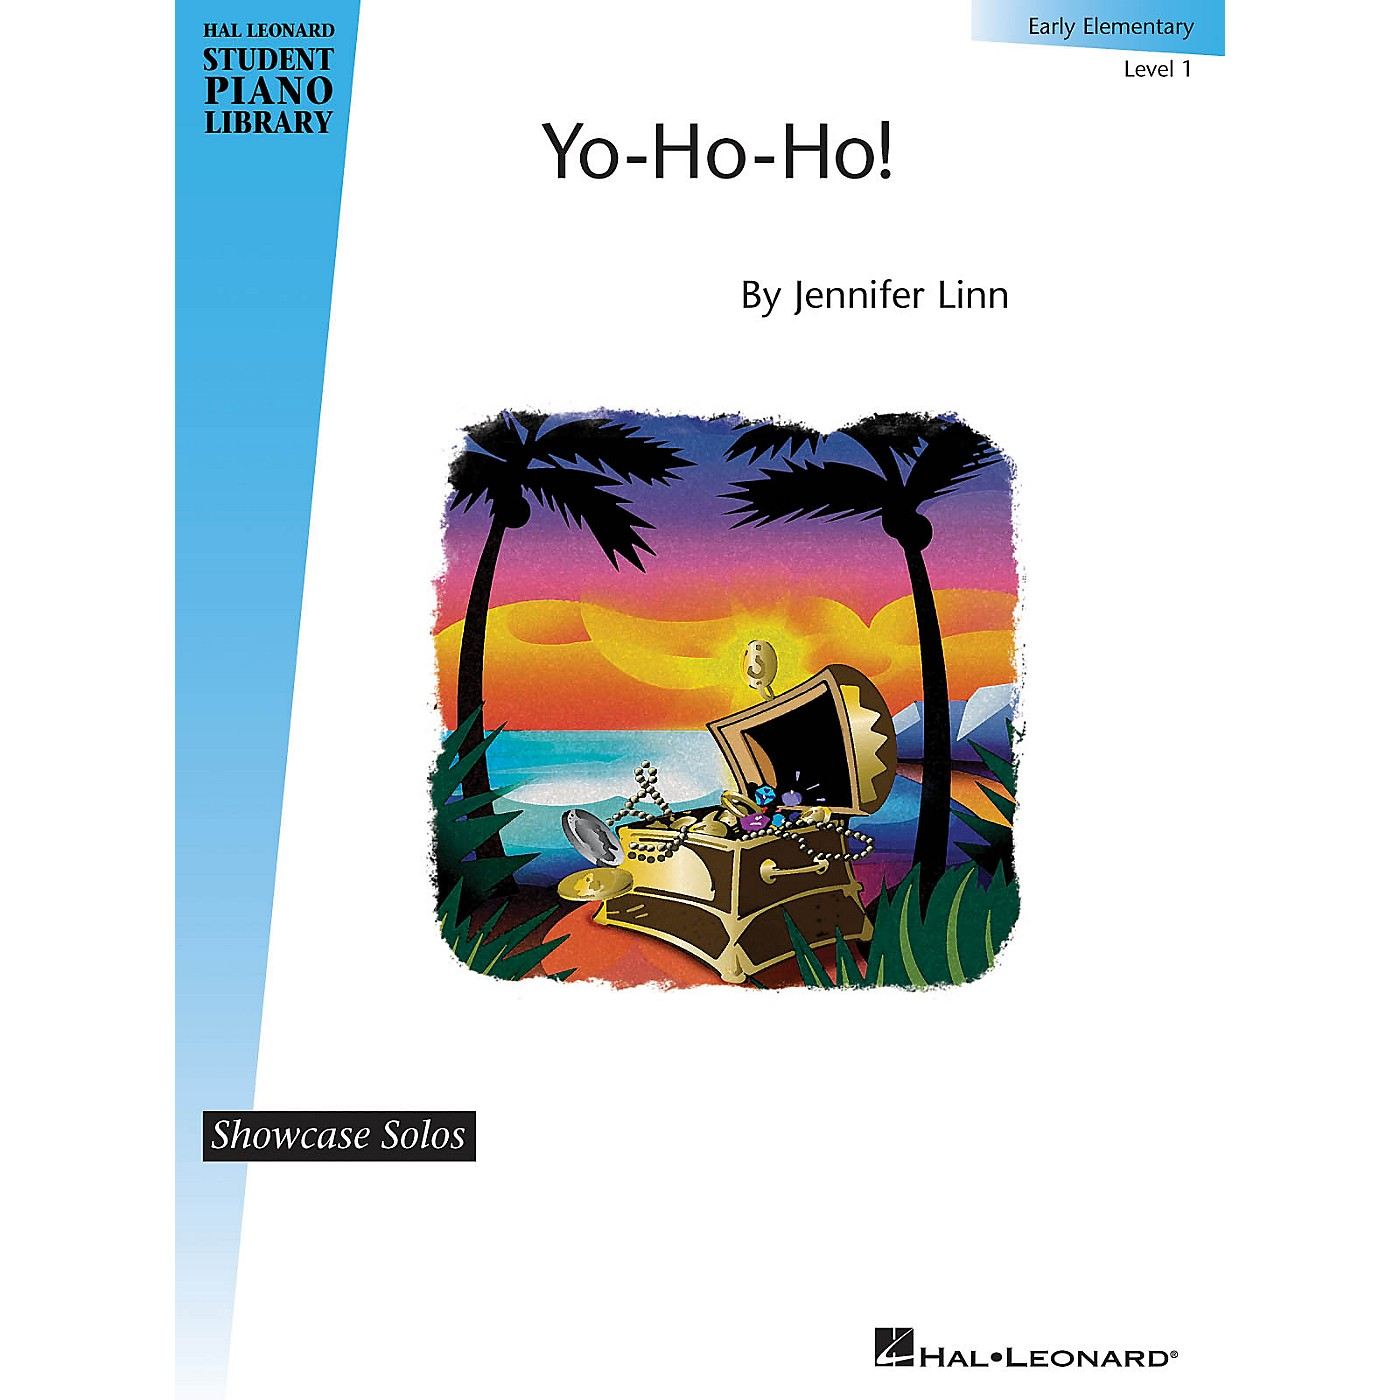 Hal Leonard Yo-Ho-Ho! (Showcase Solos Early Elem - Level 1) Piano Library Series by Jennifer Linn thumbnail